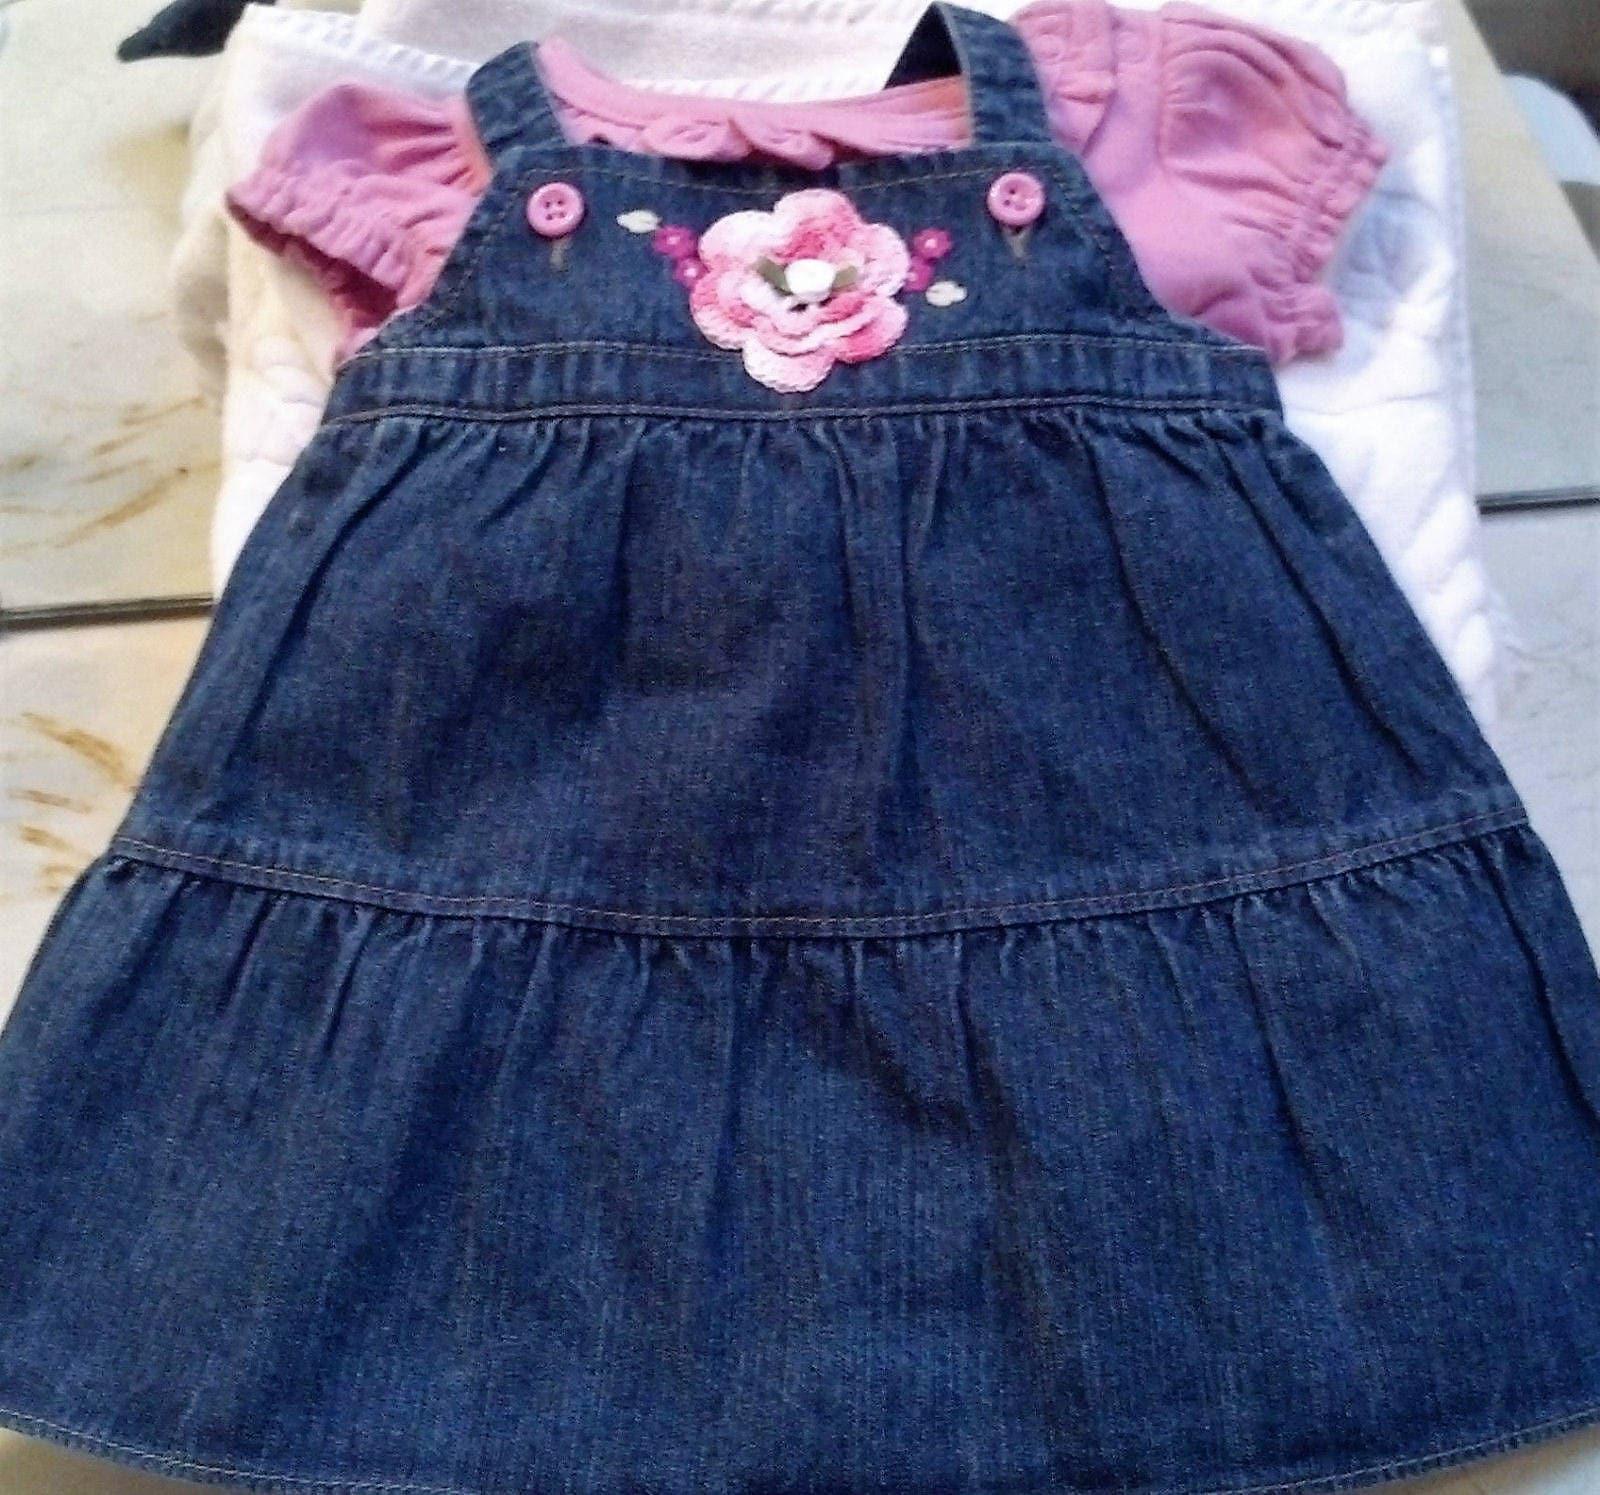 05f42946c9 Girls Baby Infant Newborn Blue Denim Jumper Dress Outfit Set